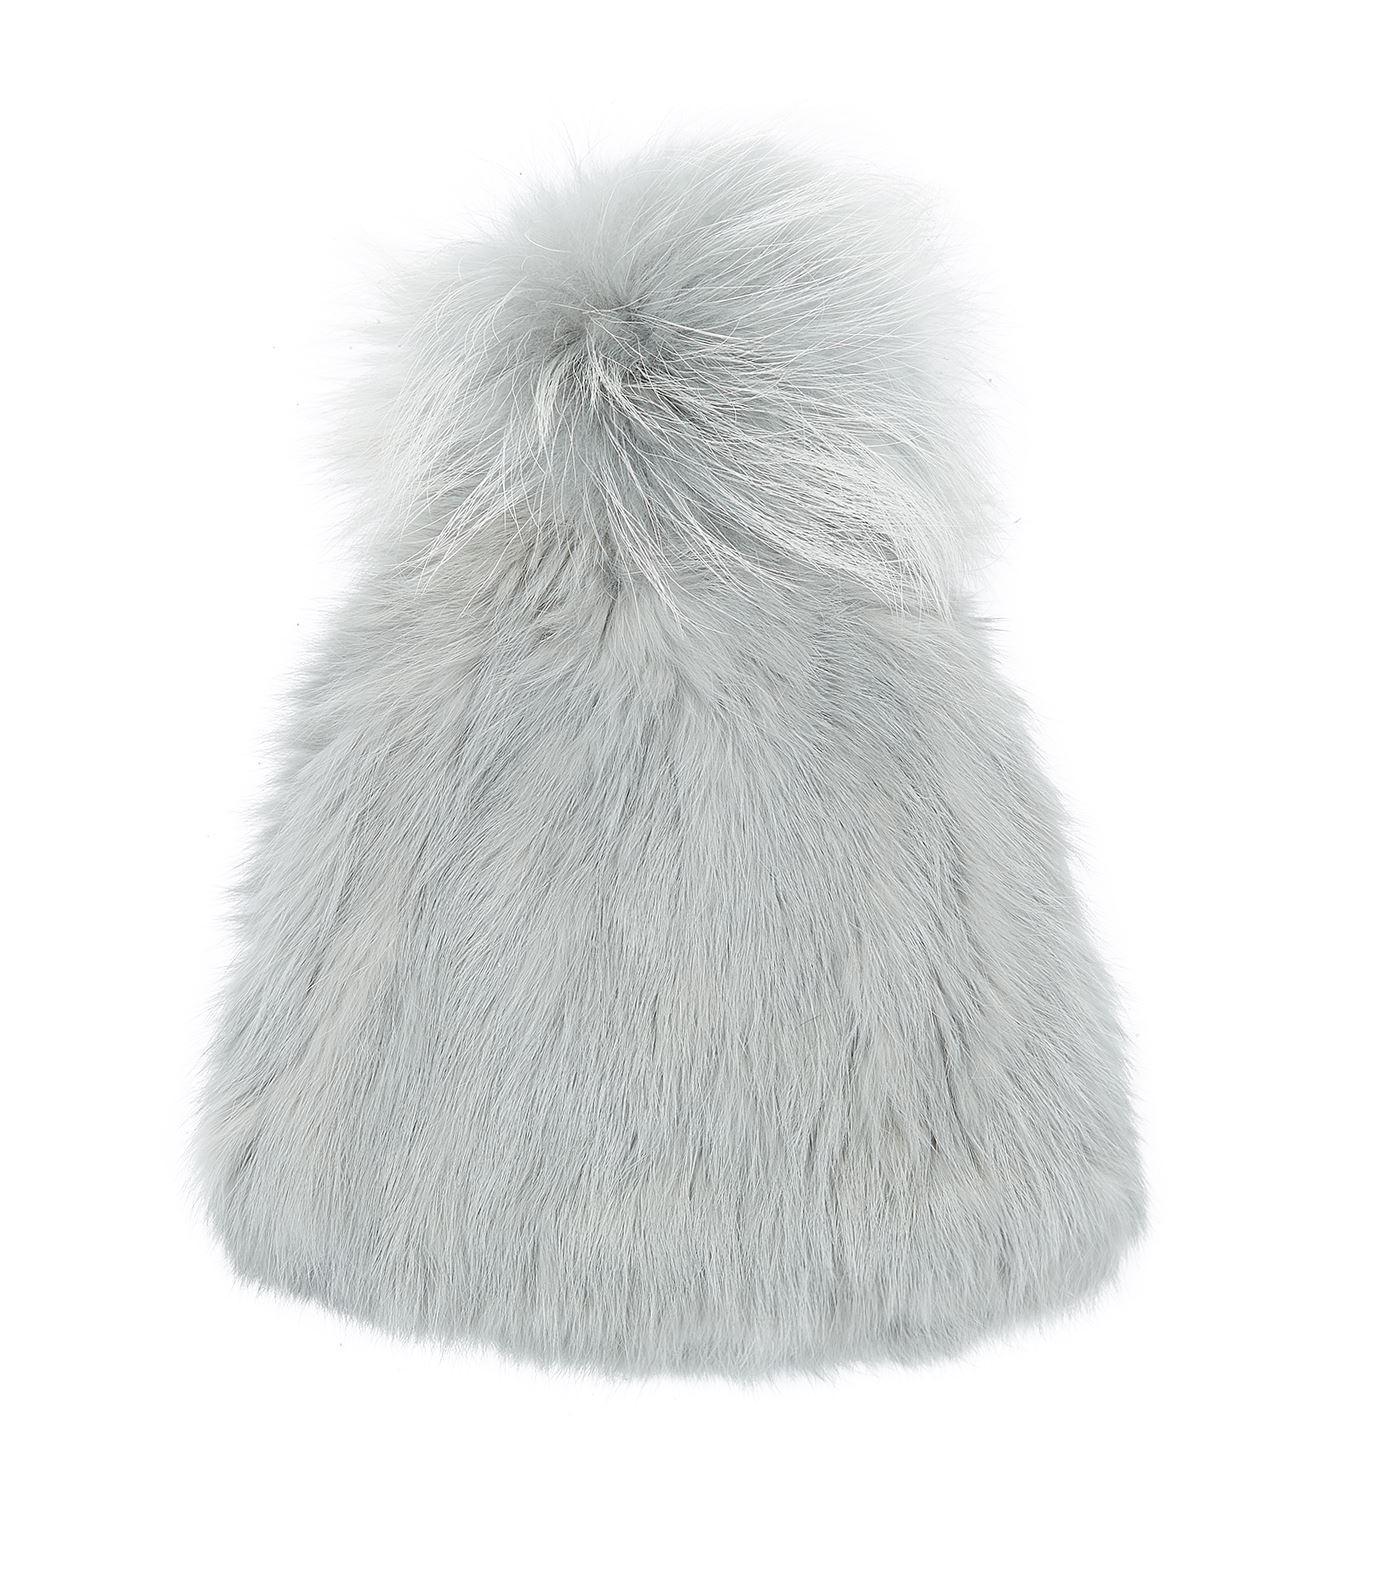 b3da9aca229 Lyst - Yves Salomon Rabbit Fur Bobble Hat in Green